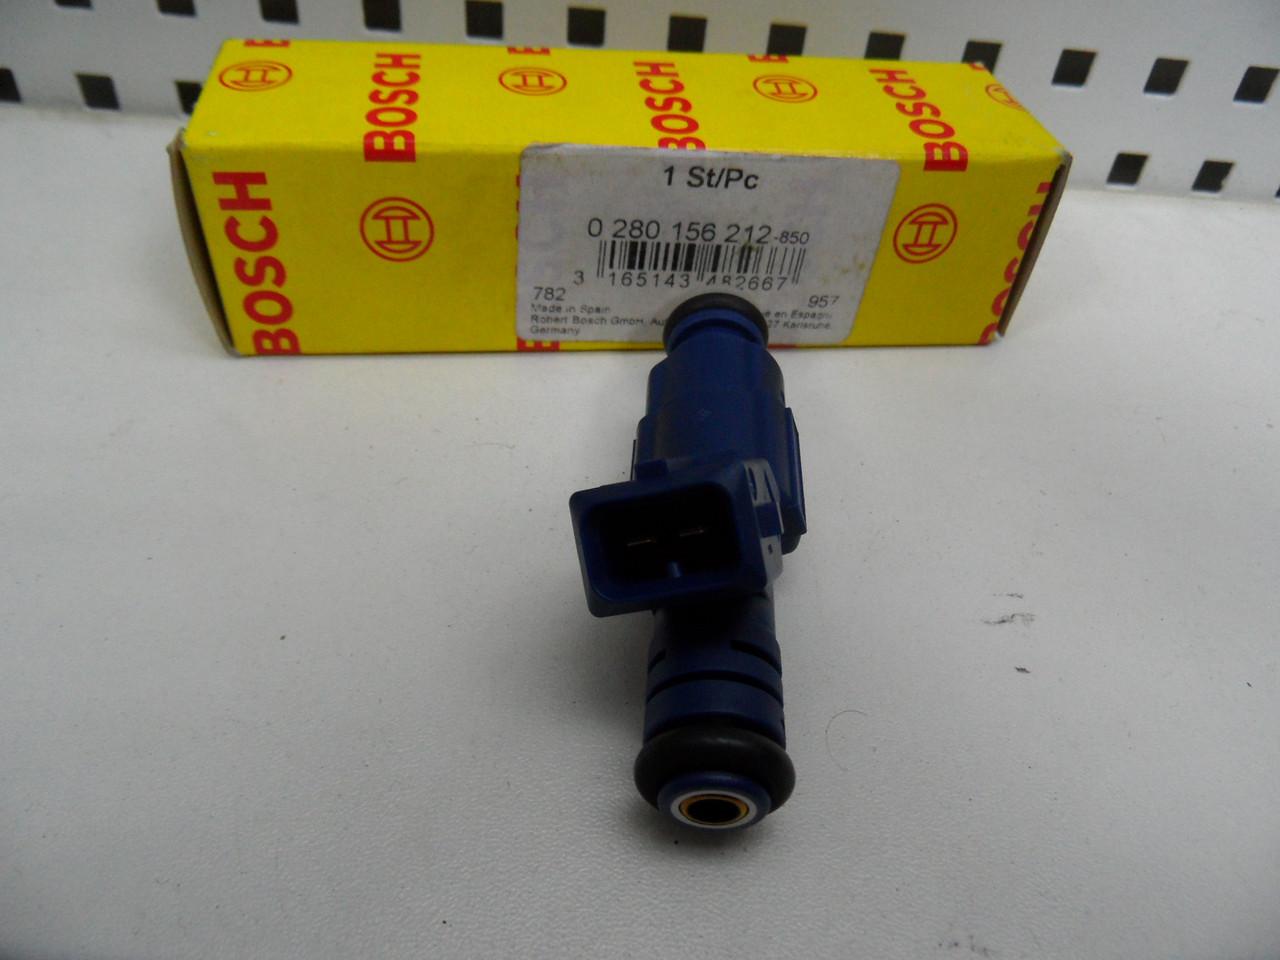 Форсунка бензиновая Bosch ВАЗ 0280156212, 0280155712, 0 280 156 212, 0 280 155 712, 93177457, Opel,